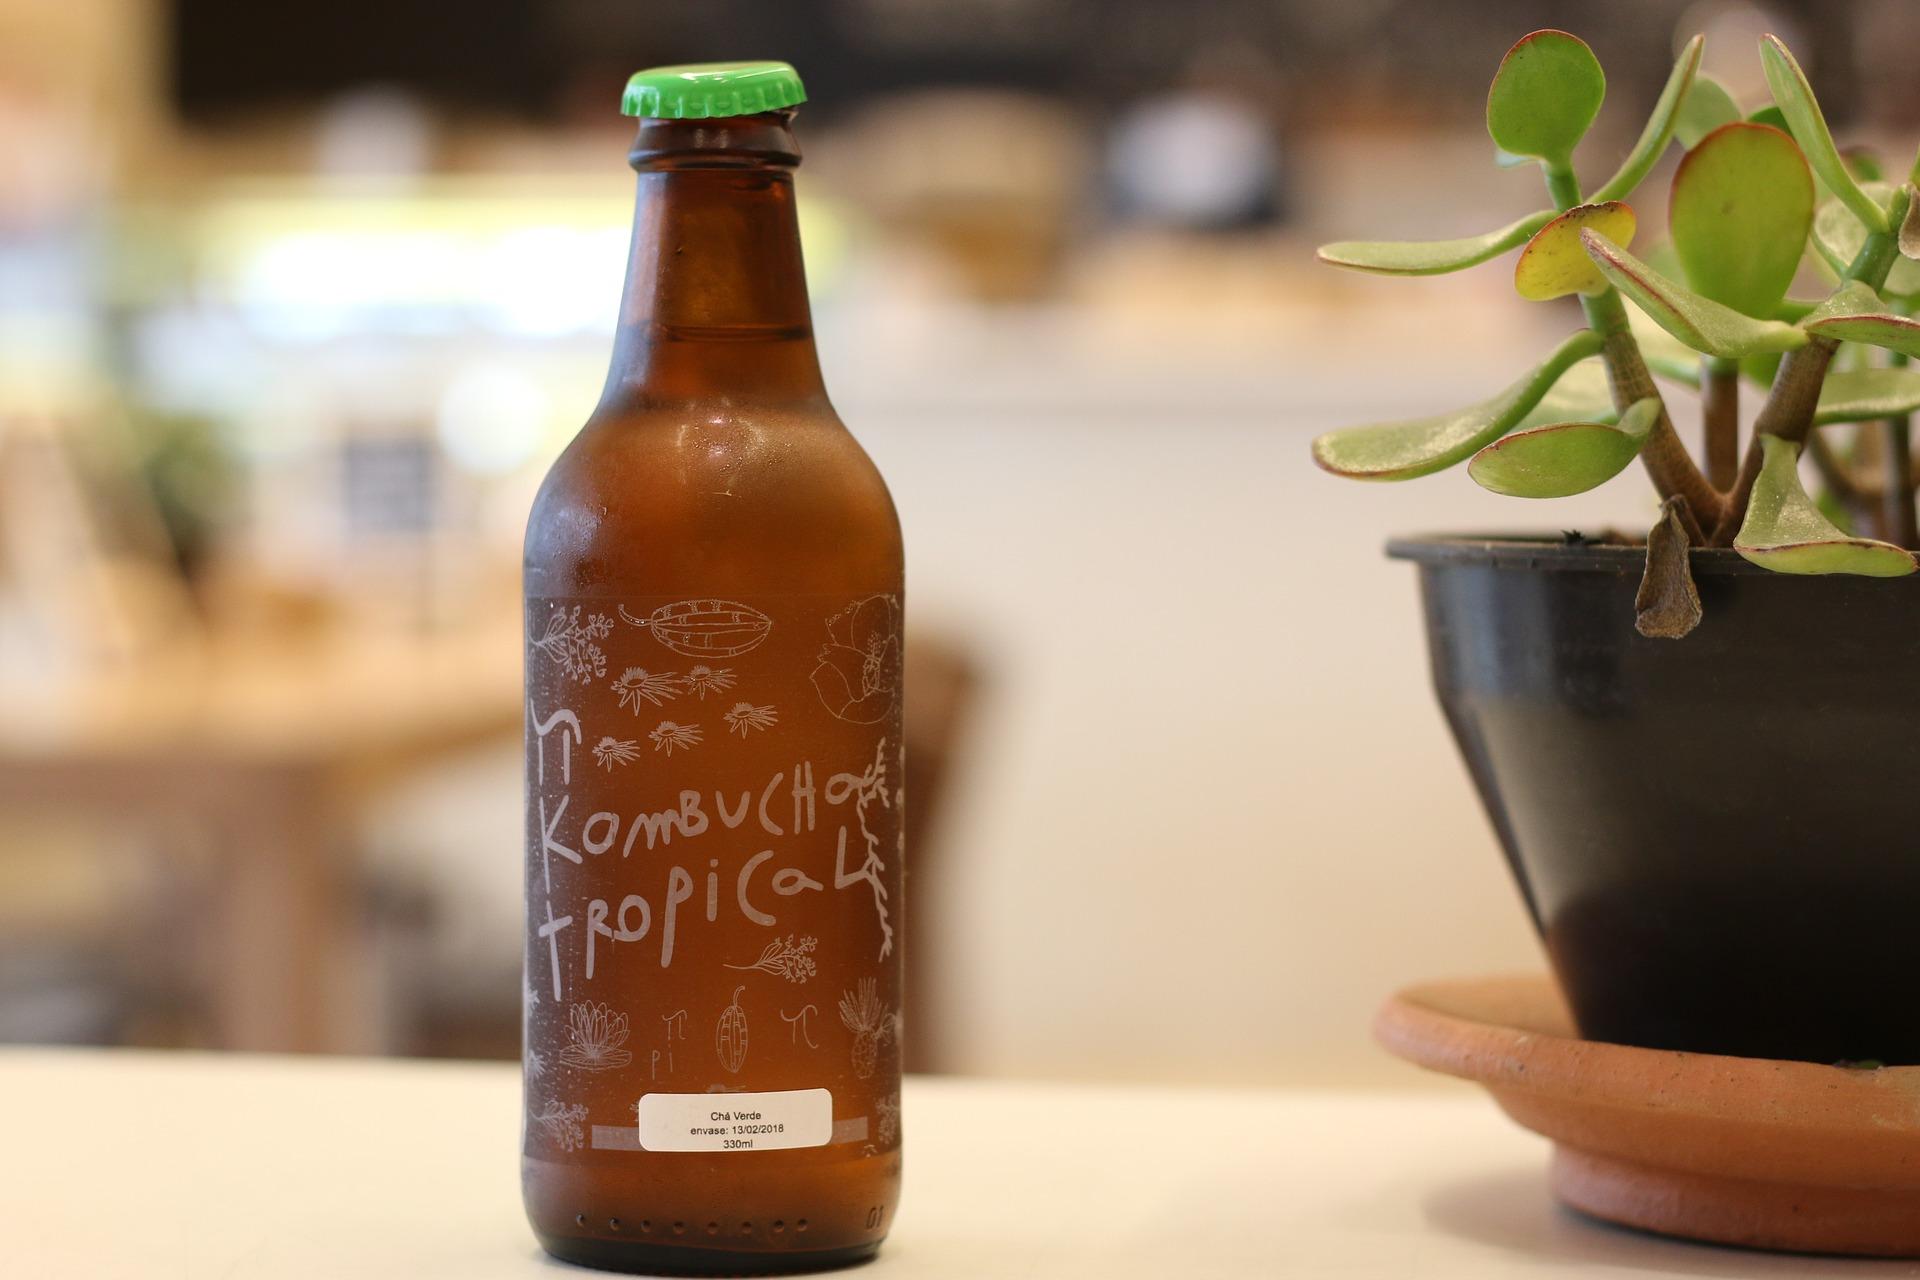 Imagem mostra uma garrafa de kombucha.